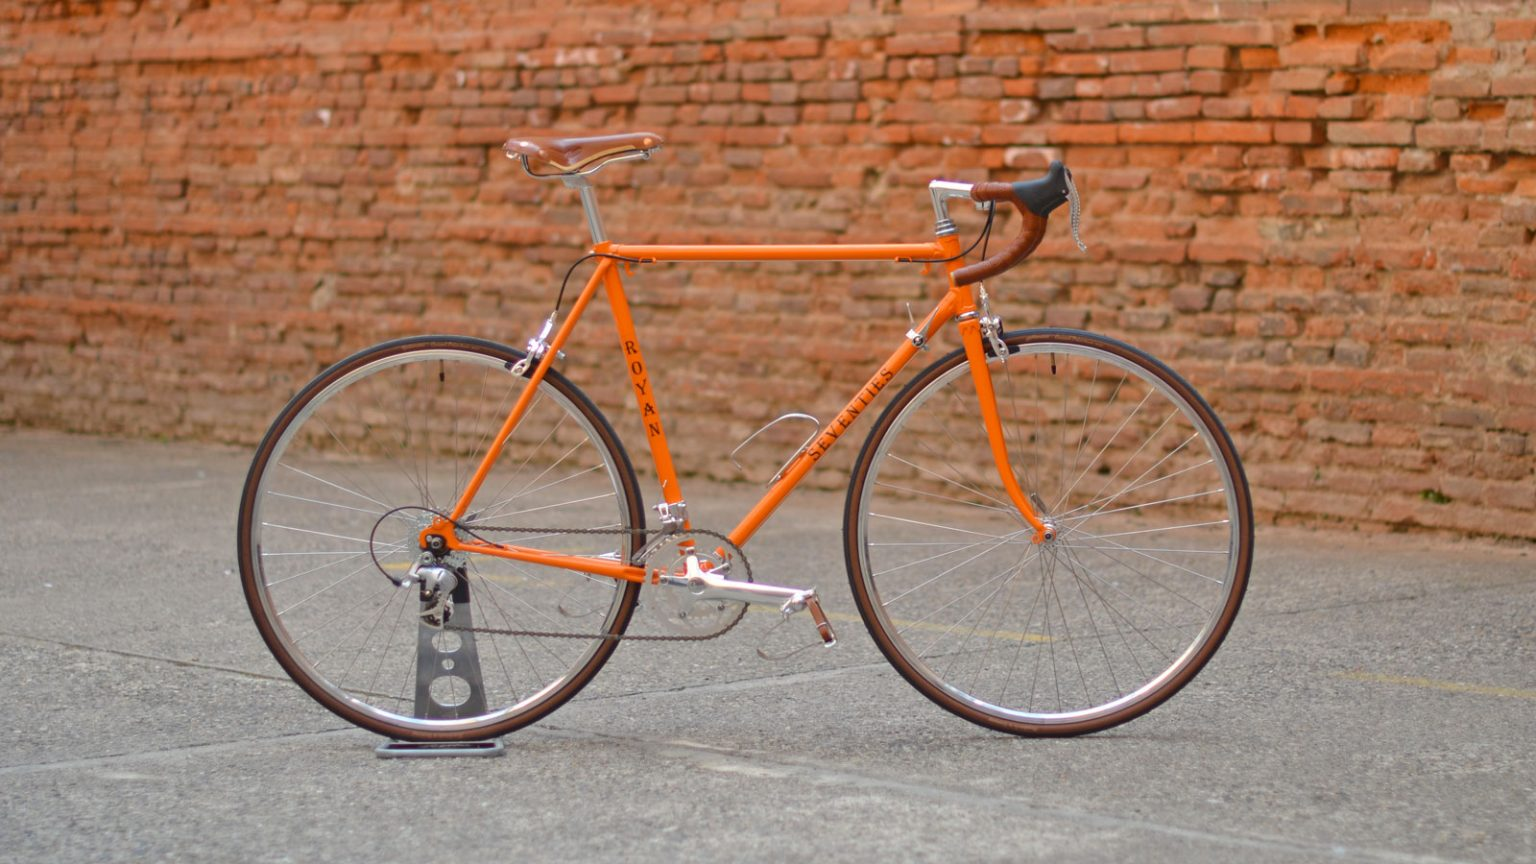 Peugeot Tourmalet 1536x864